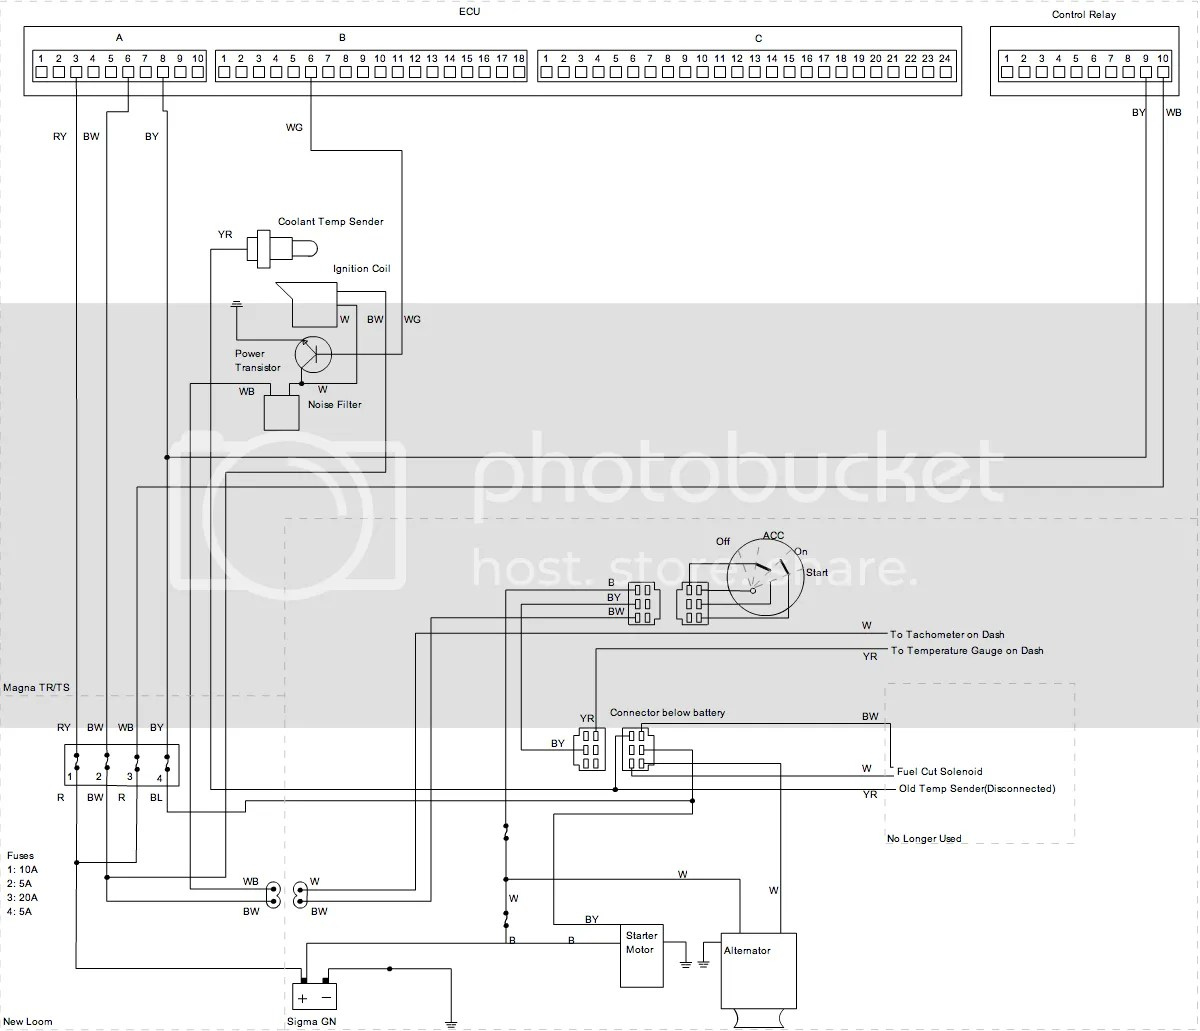 tj magna radio wiring diagram vw golf mk5 mitsubishi verada stereo medium resolution of 380 audio library rh 16 evitta de